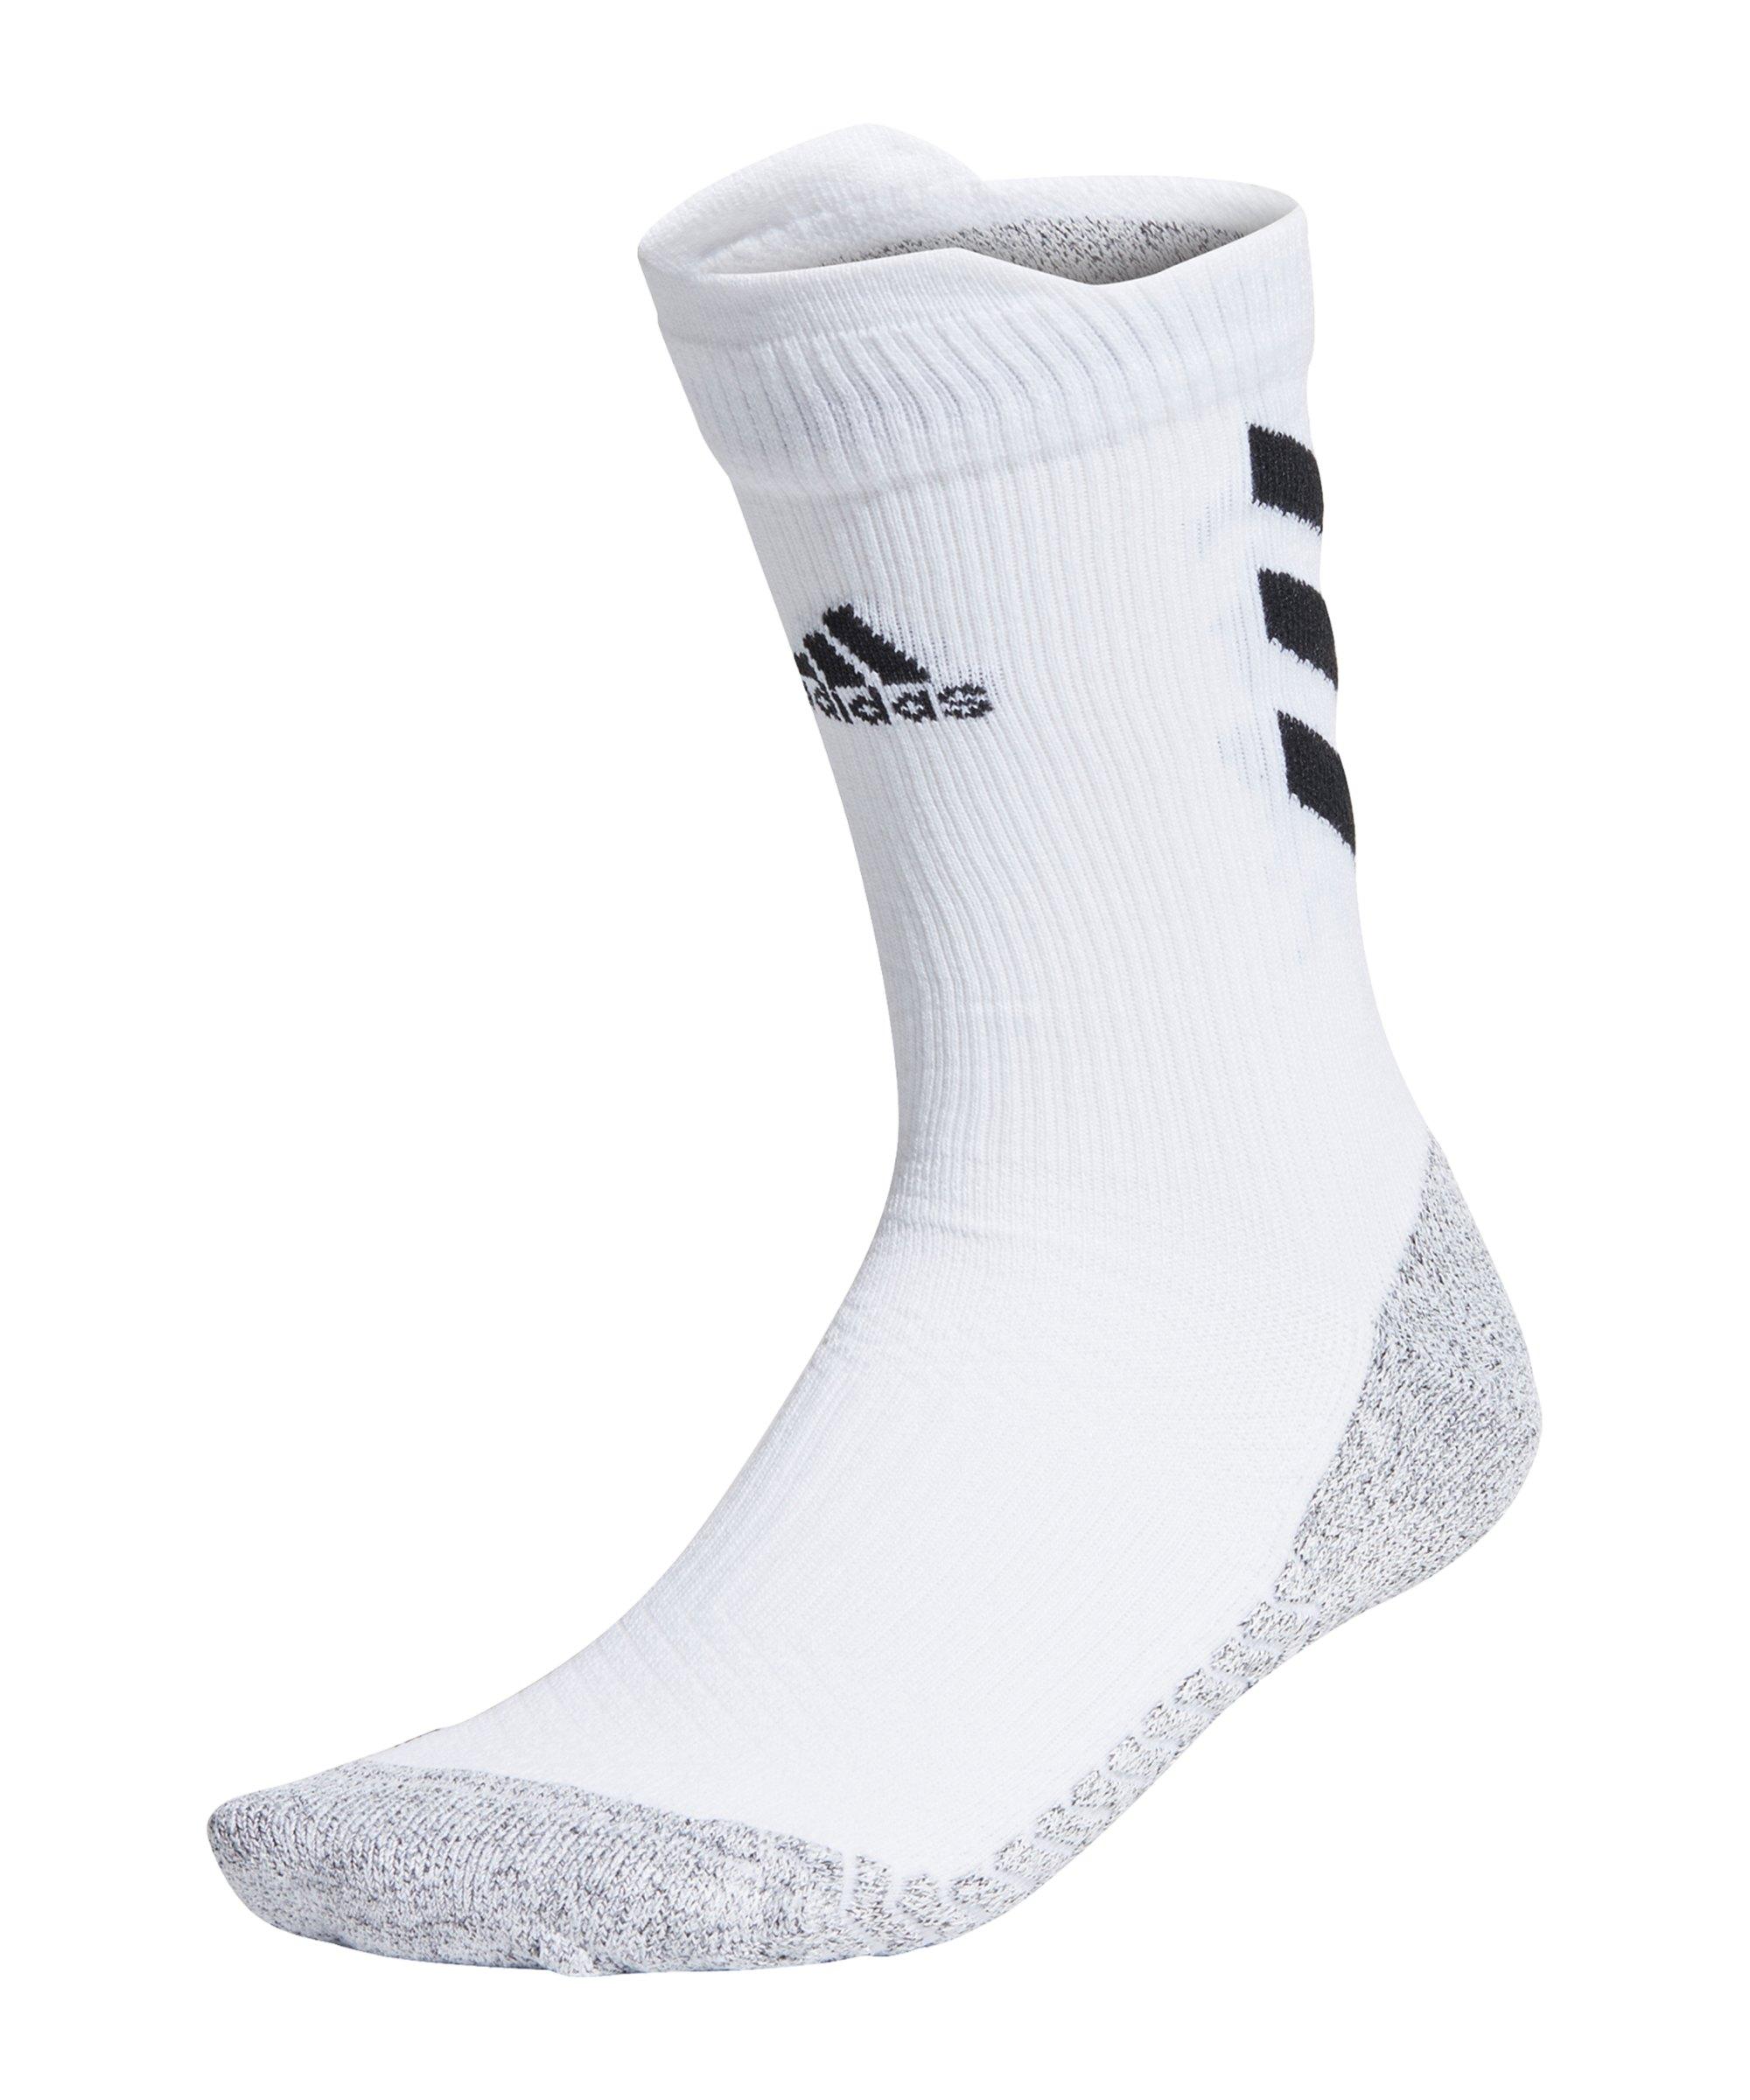 adidas Alphaskin Crew Socken Weiss Schwarz - weiss